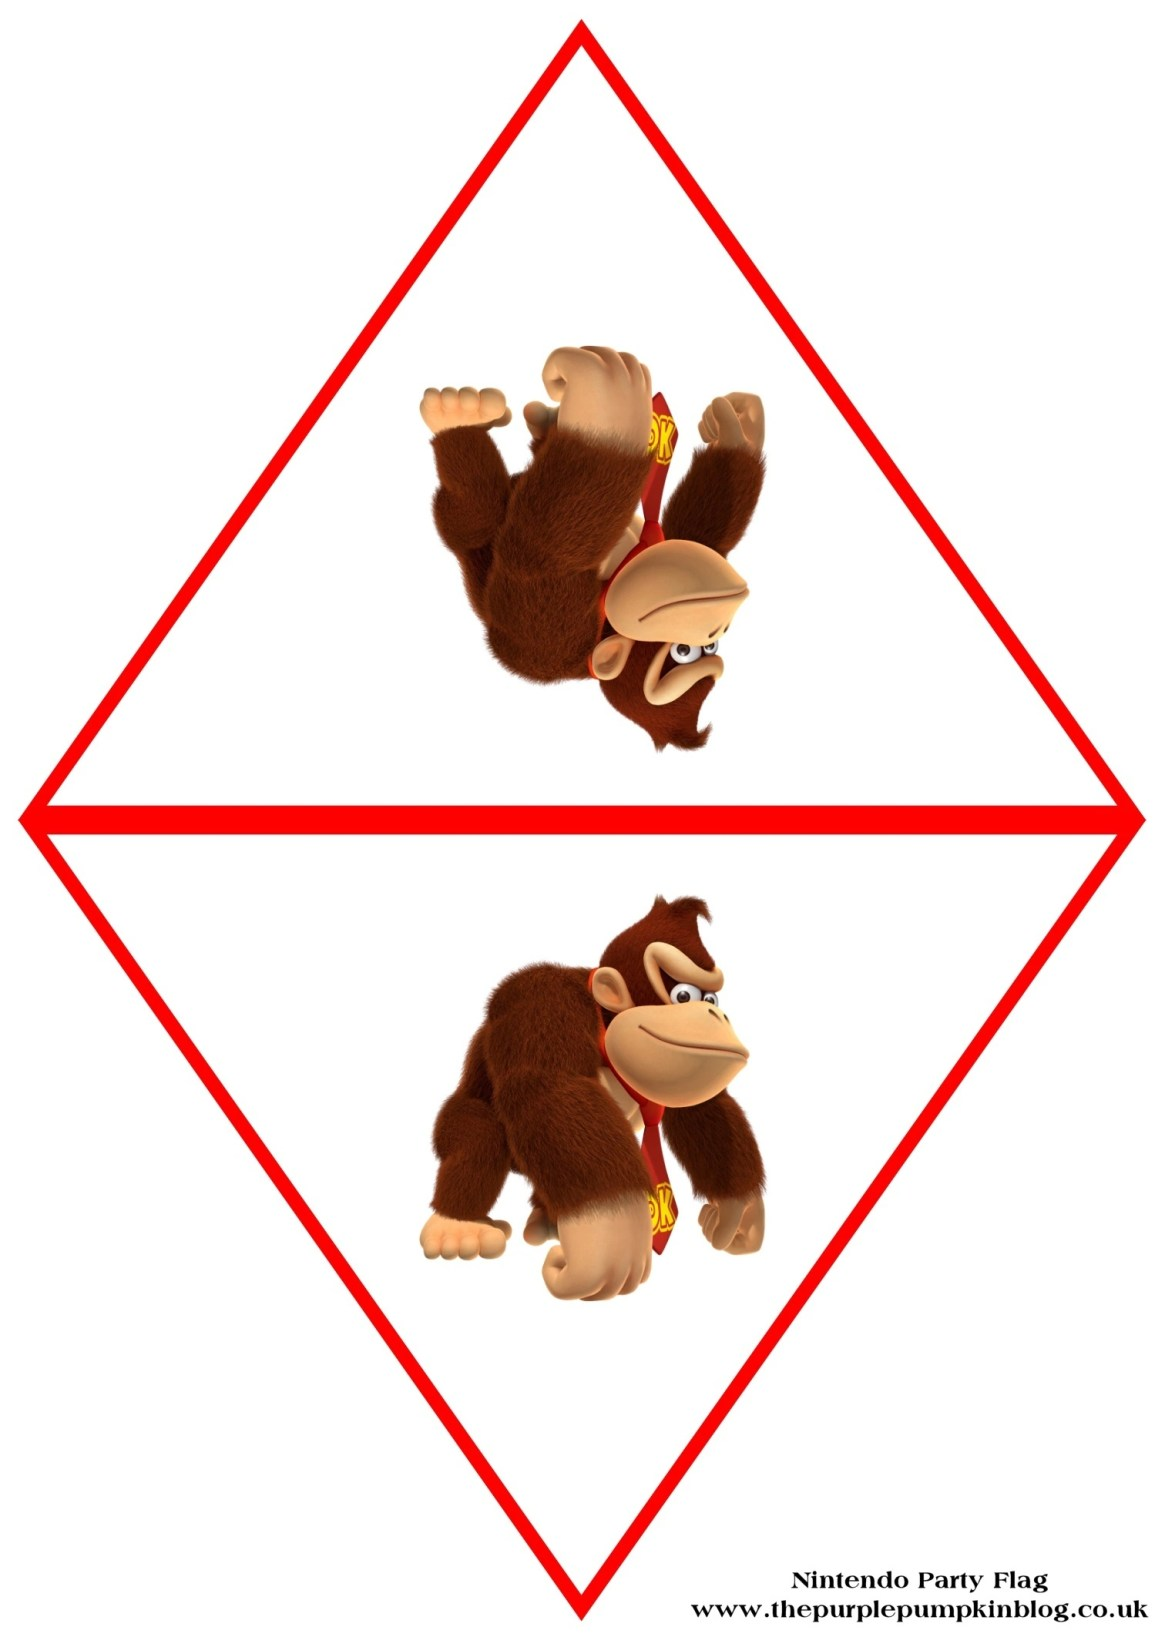 nintendo-party-flag-donkey-kong